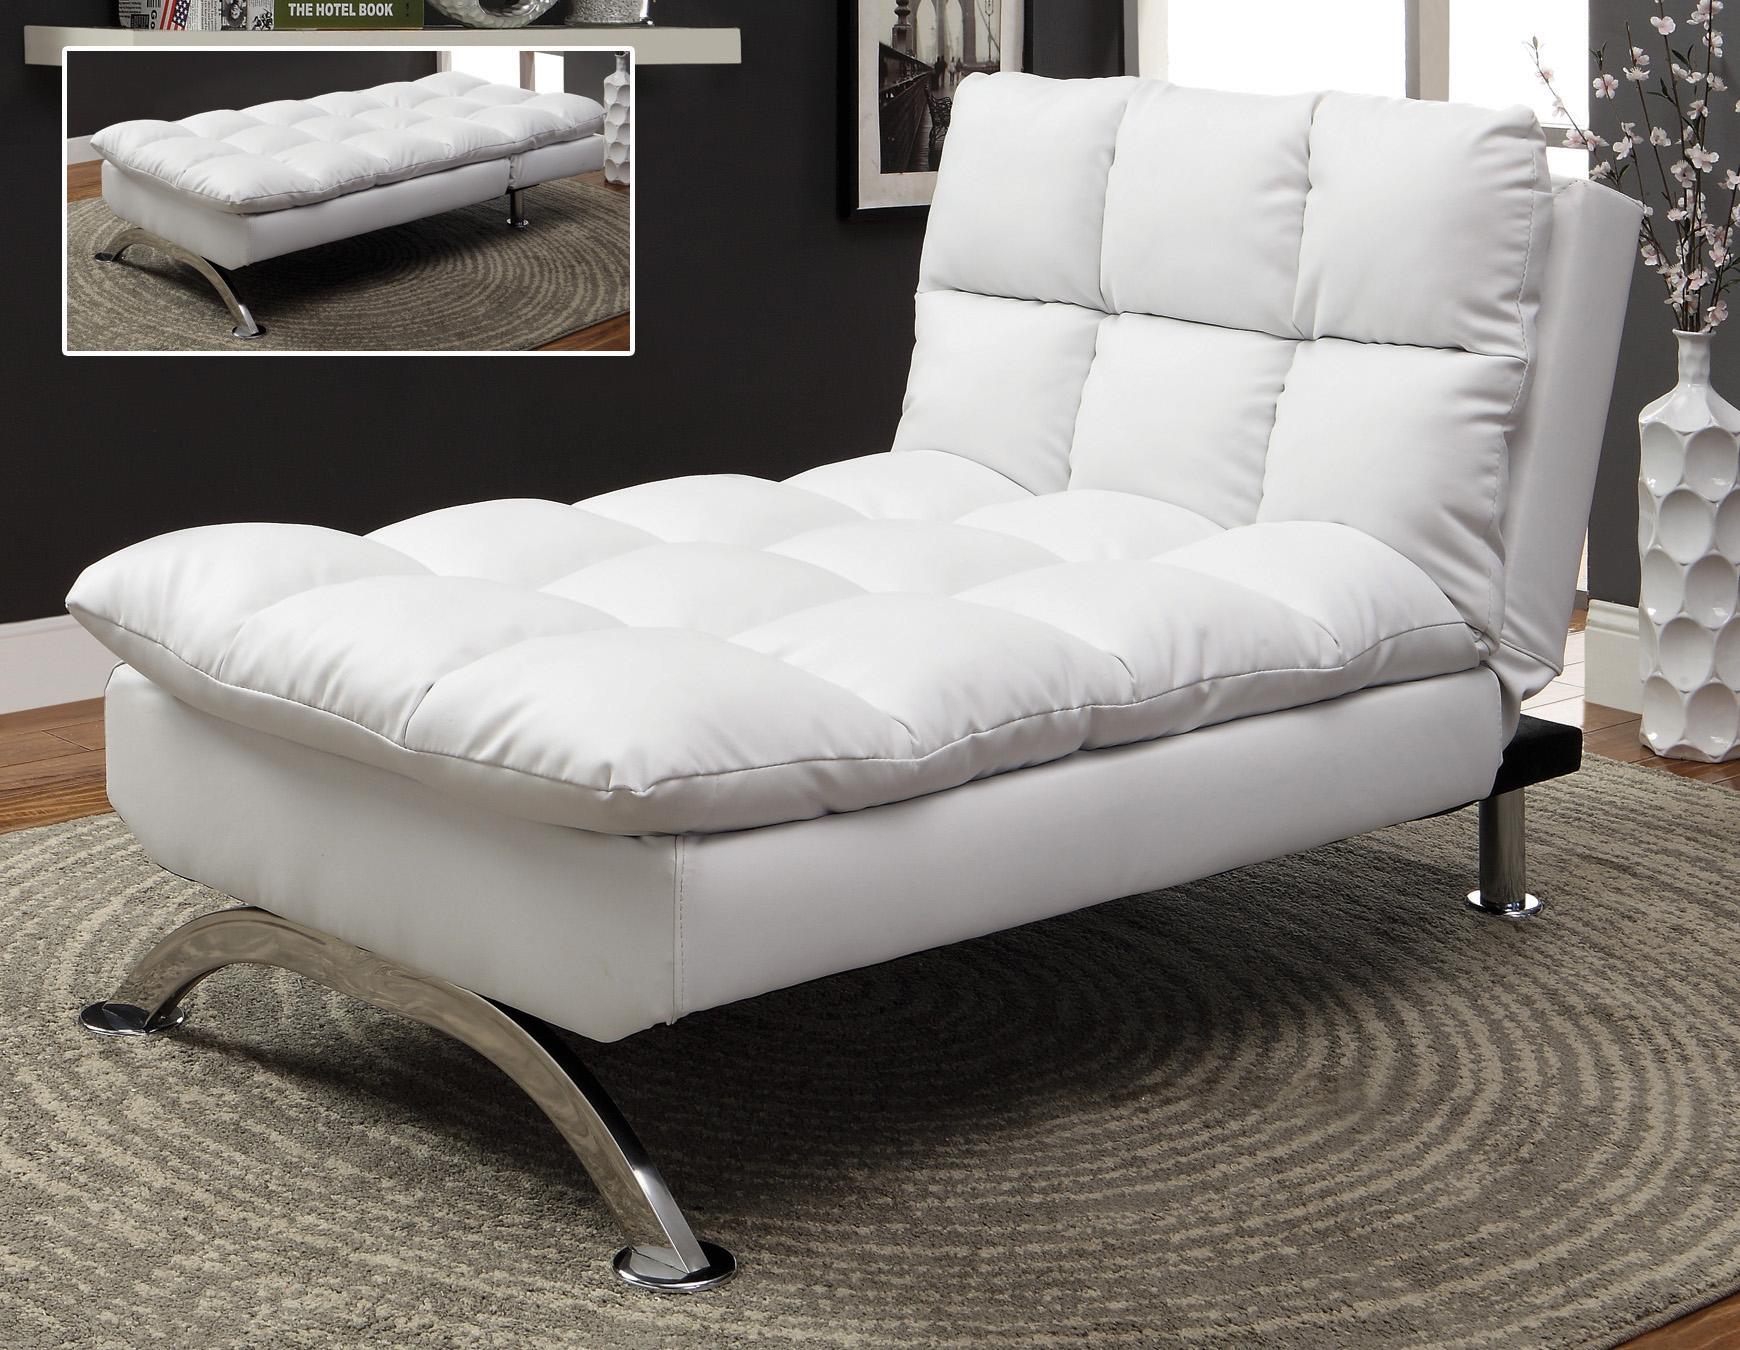 sectional sofas kijiji calgary fairway furniture sofa beds bed winnipeg   review home co